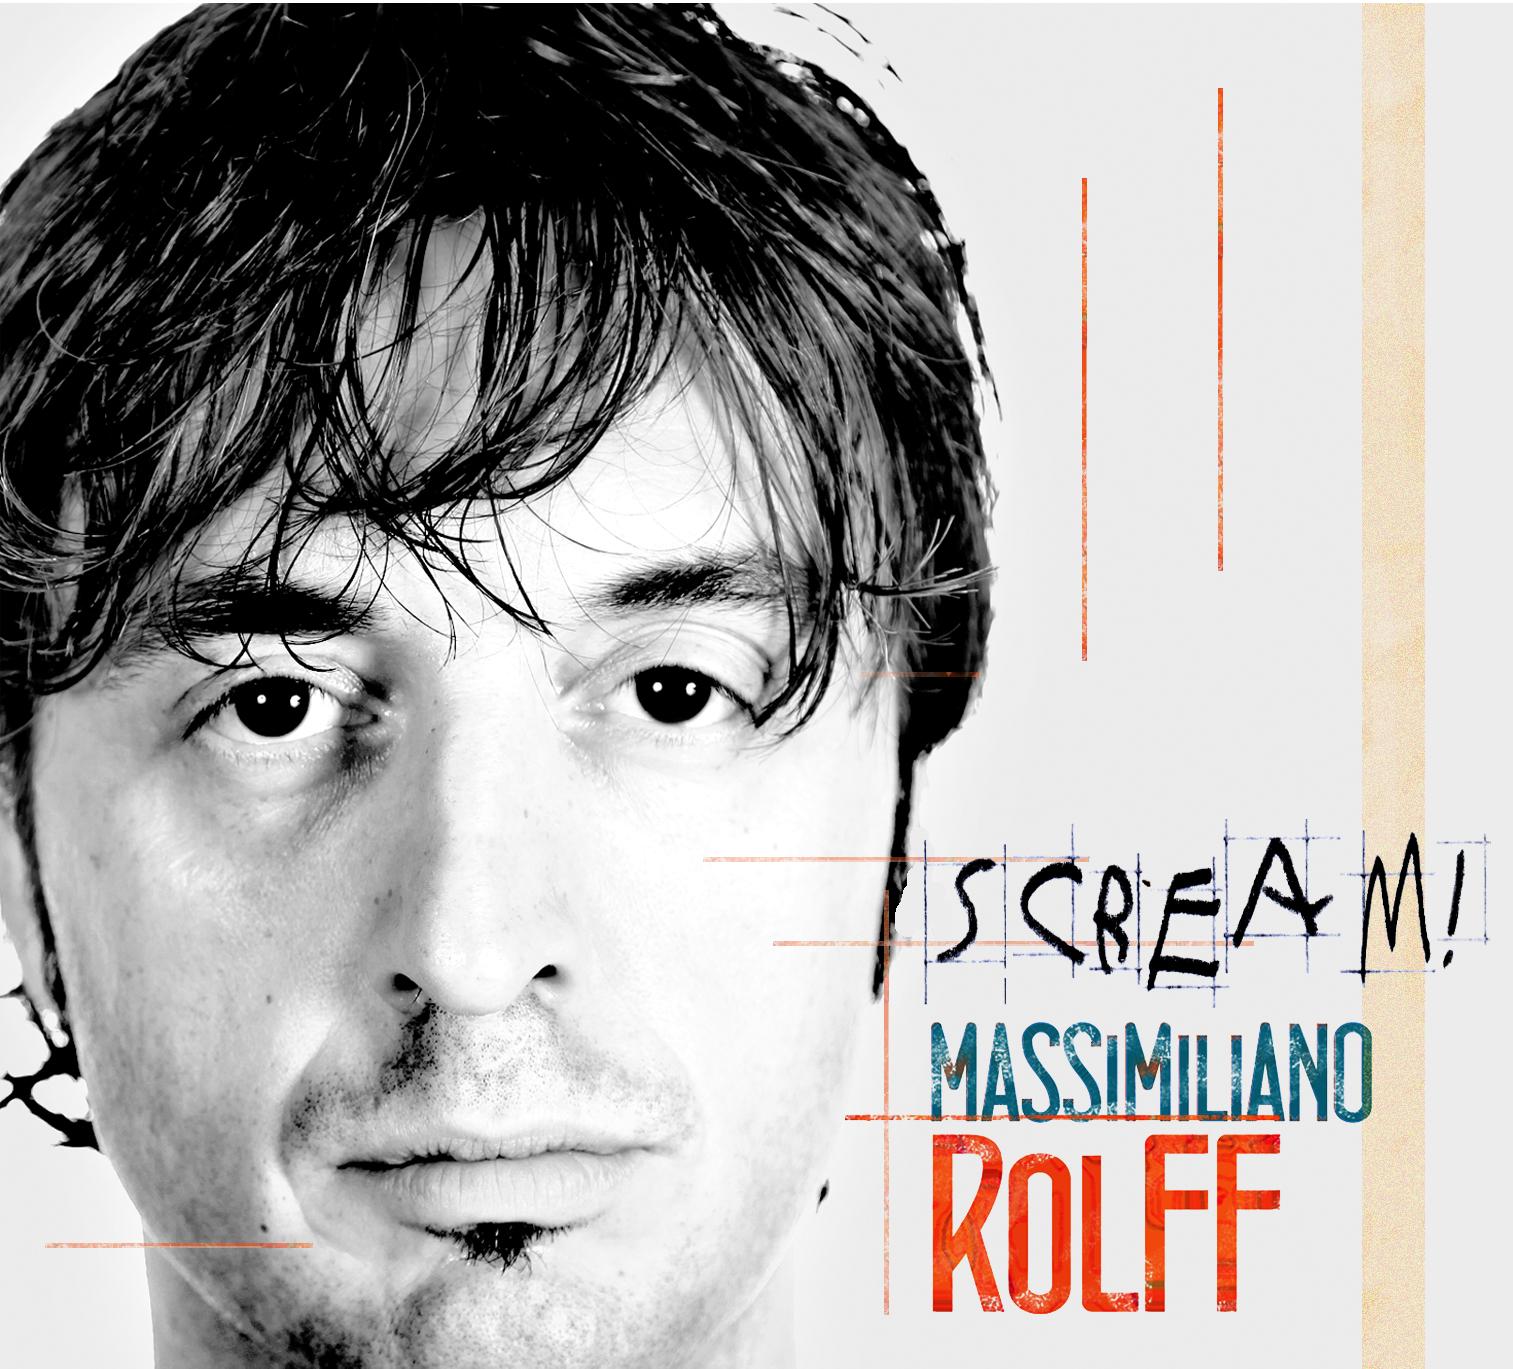 MASSIMILIANO ROLFF - Scream! cover